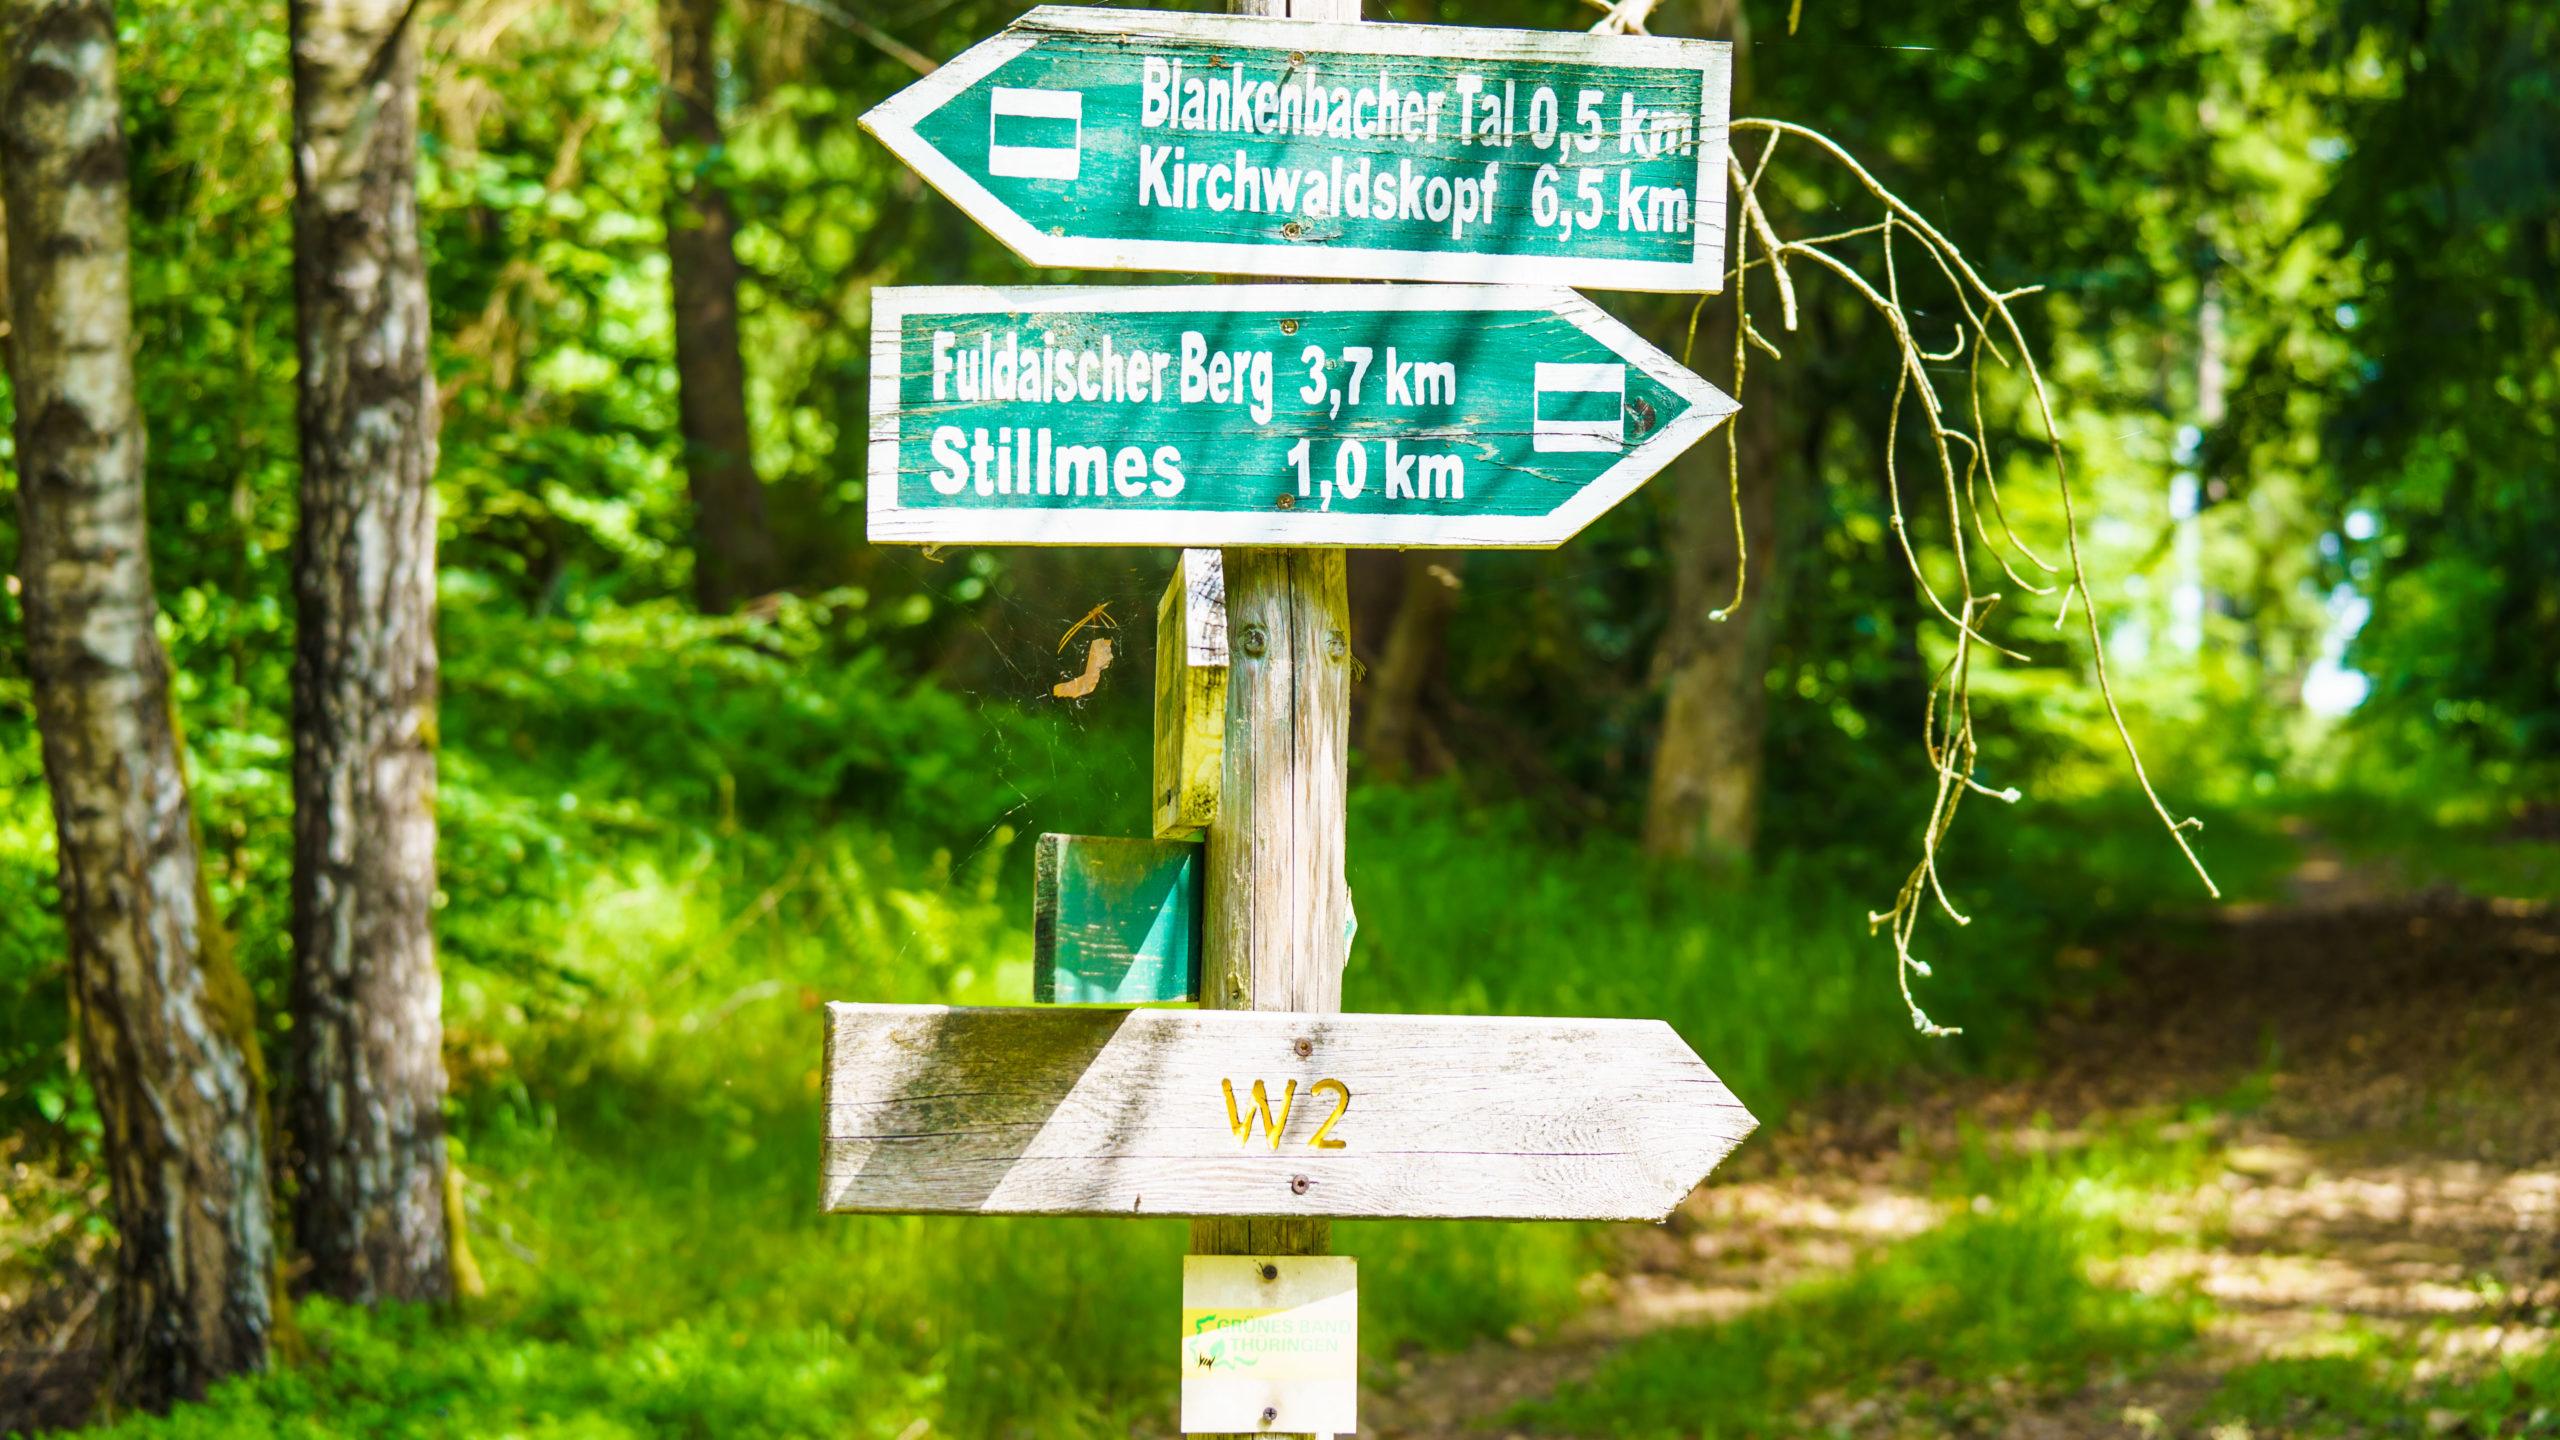 Grenzweg Gerstunger Forst, Wegweiser nahe Blankenbacher Tal